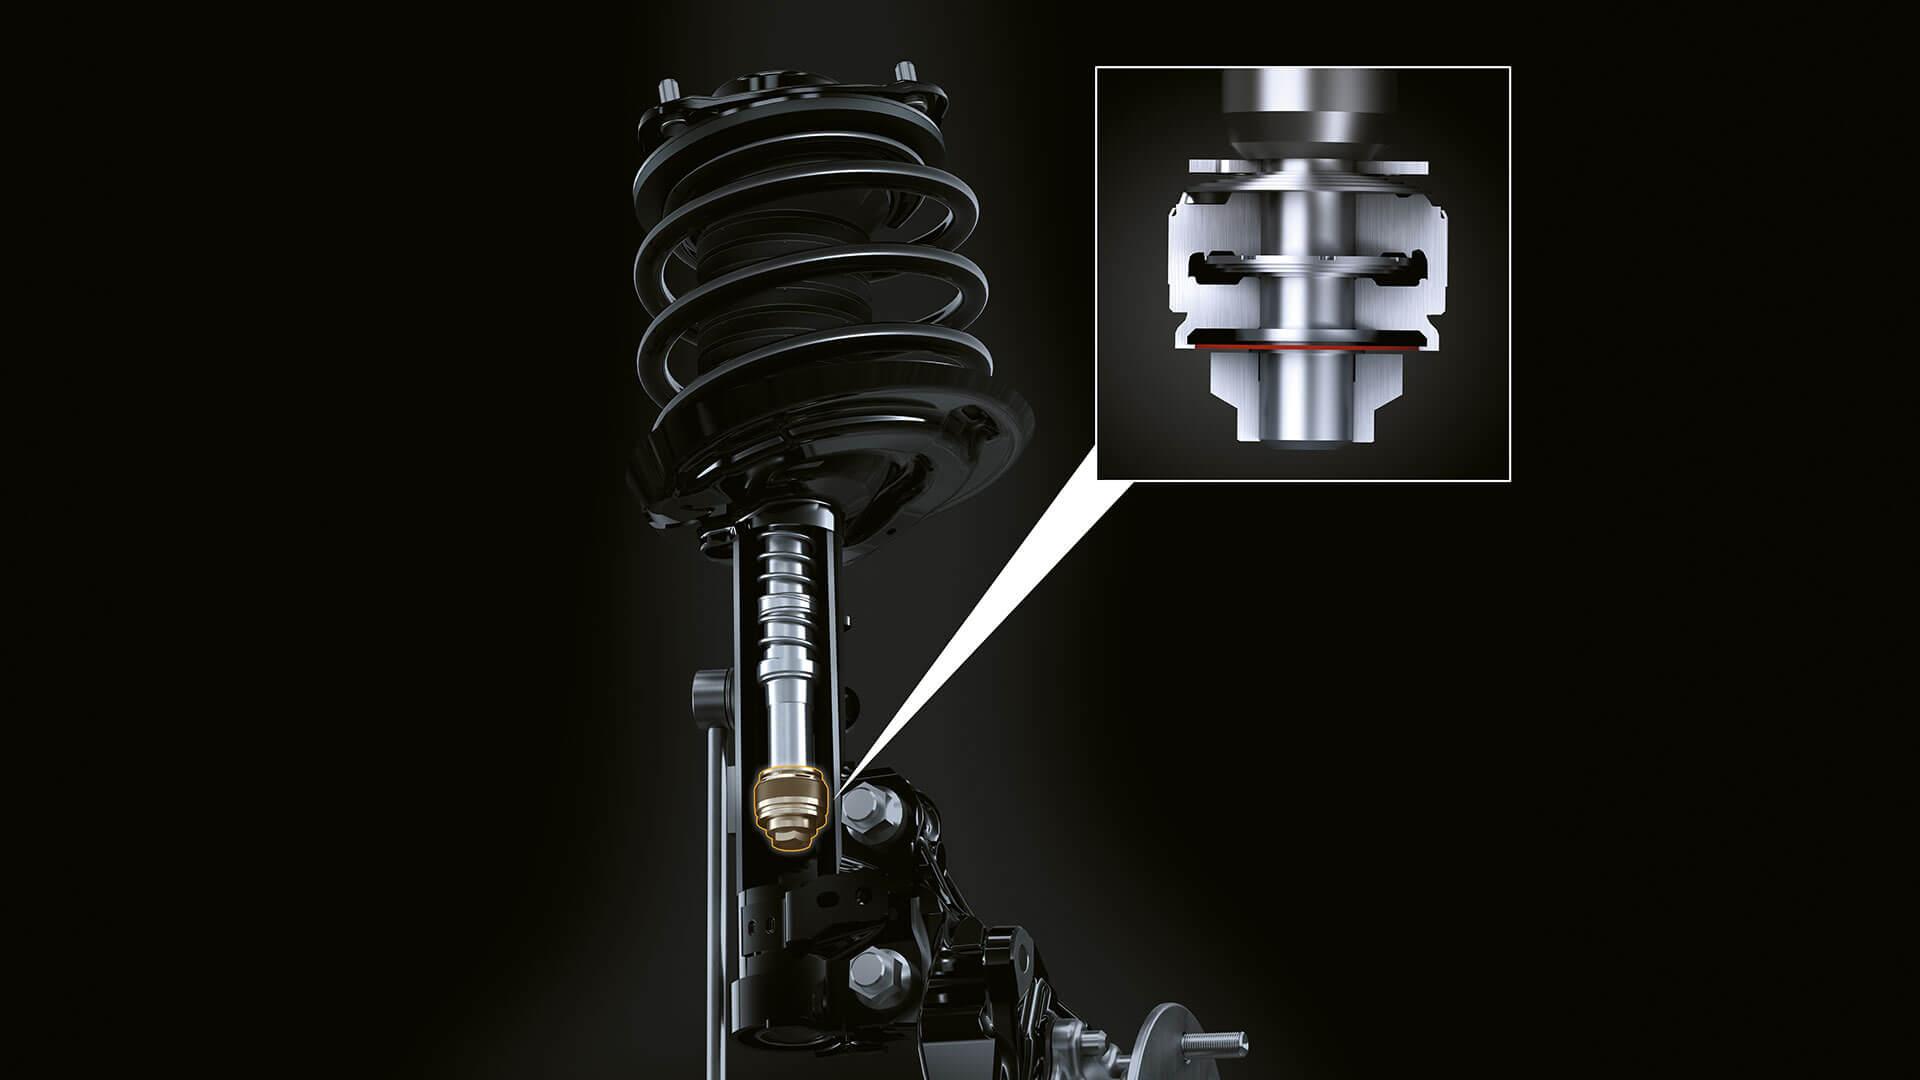 2019 lexus es hybrid experience feature swing valve shock absorber